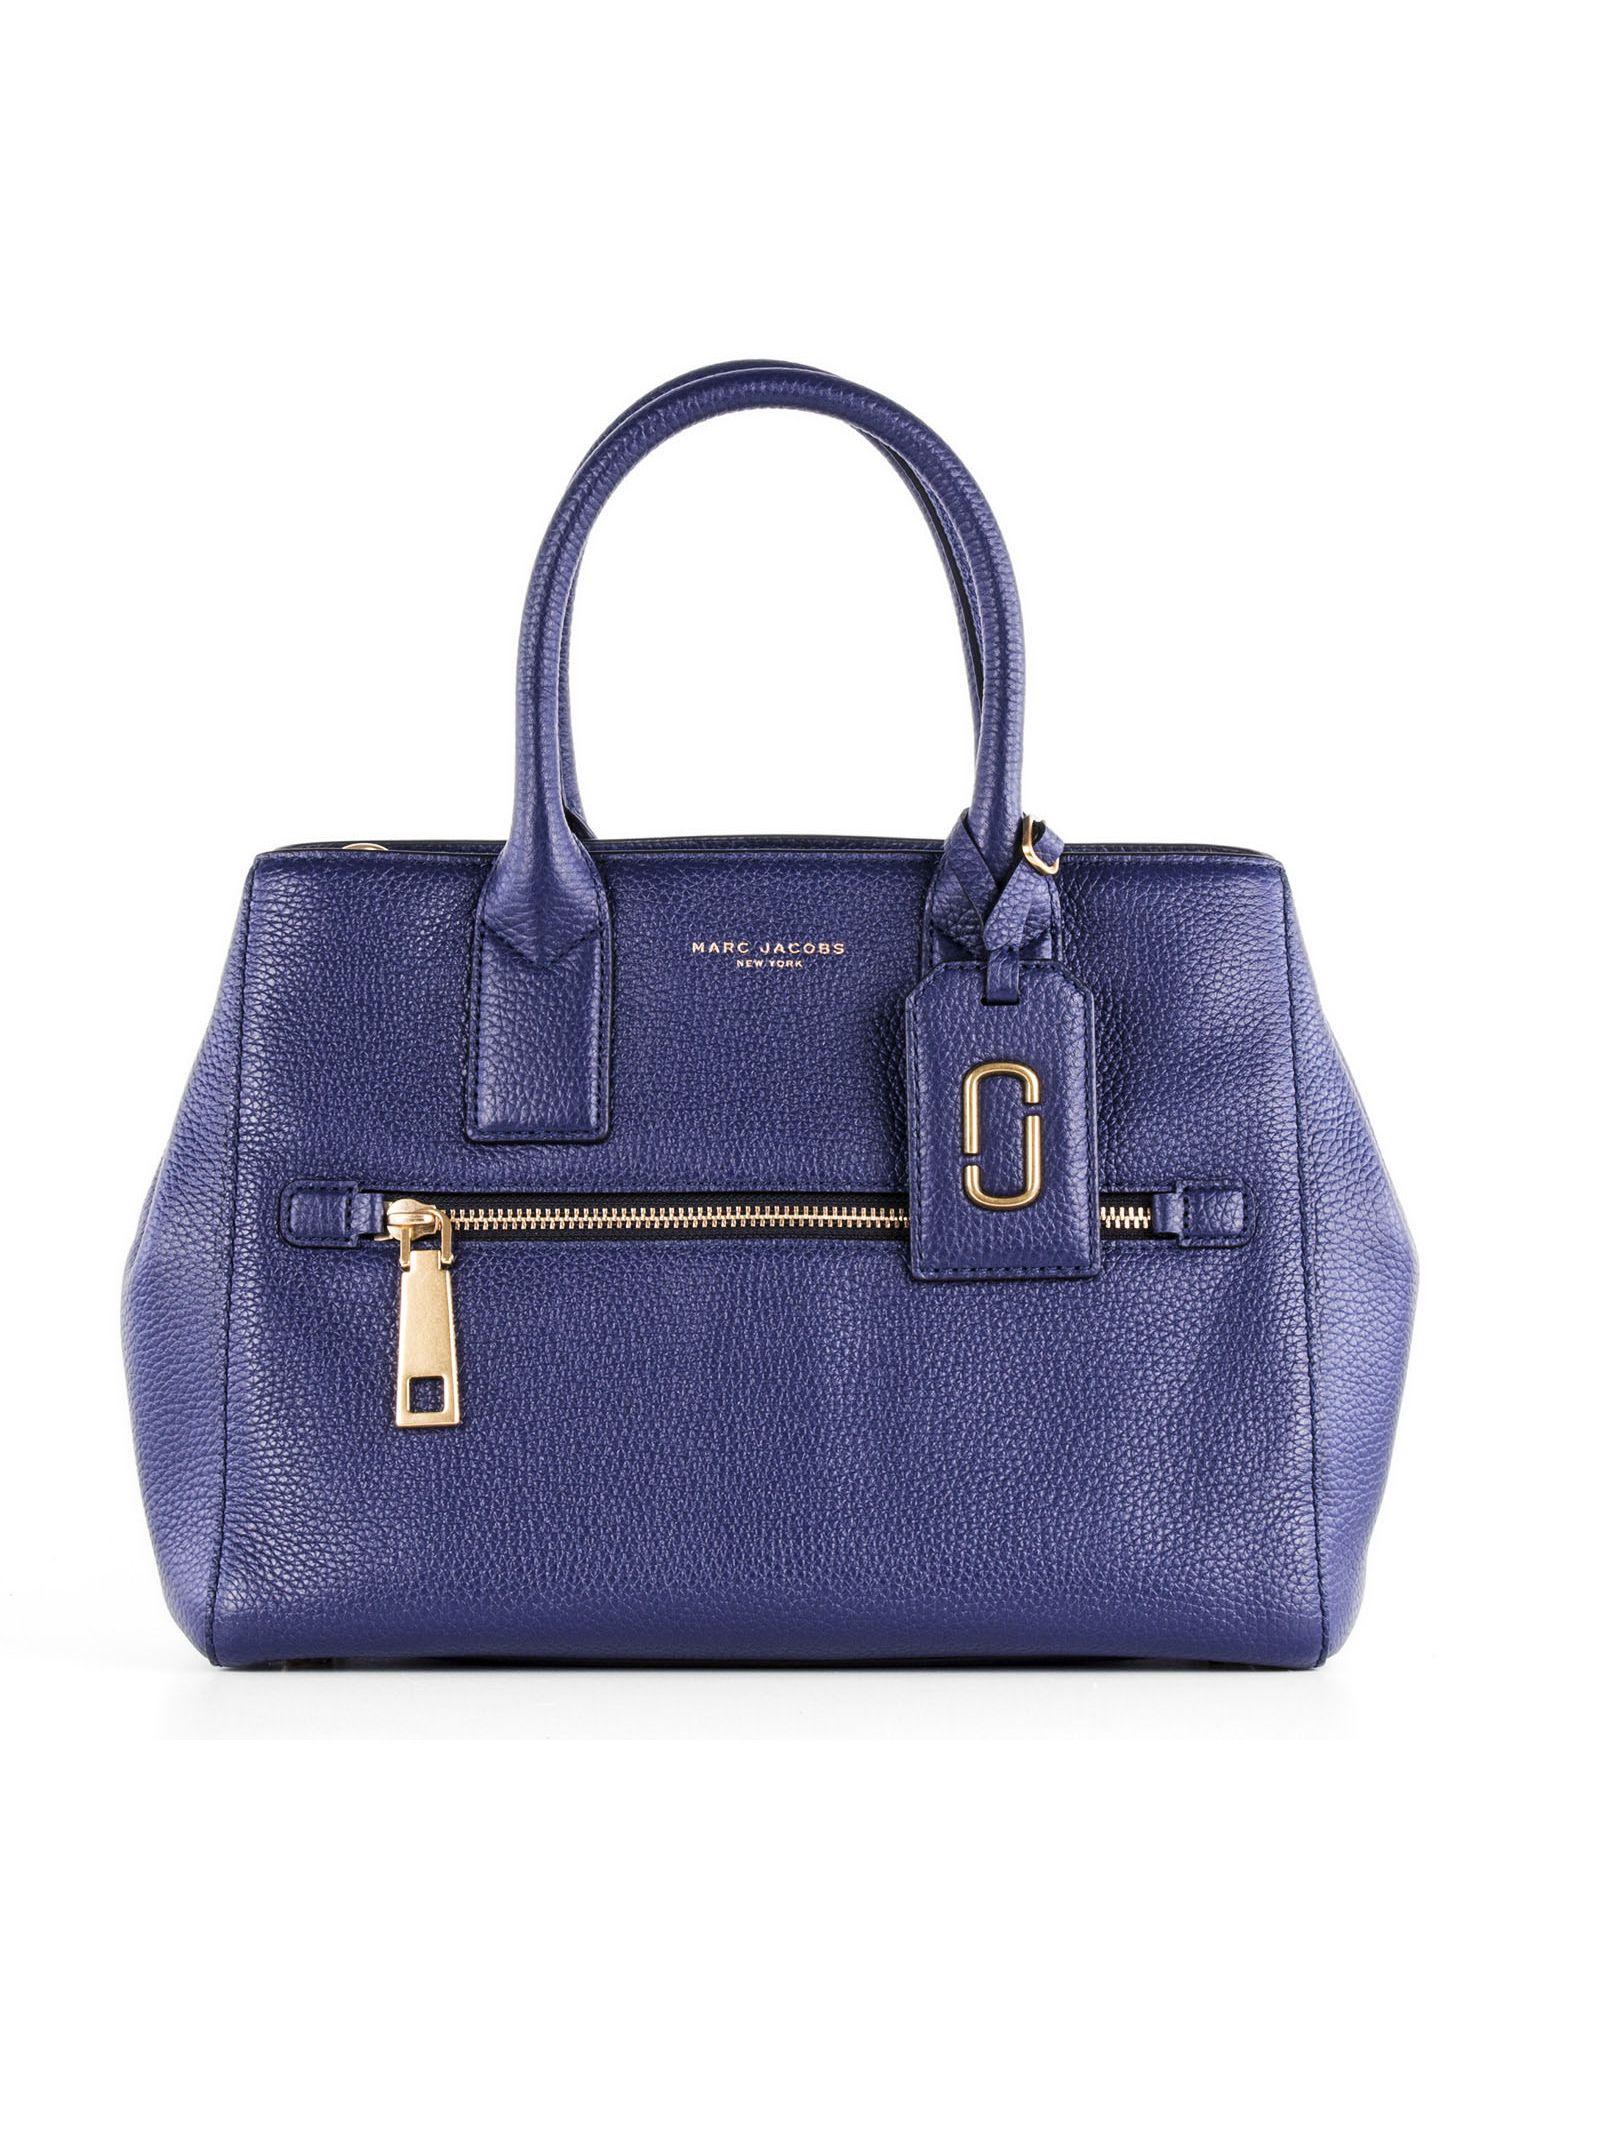 marc jacobs female 201920 marc jacobs blue leather handle bag